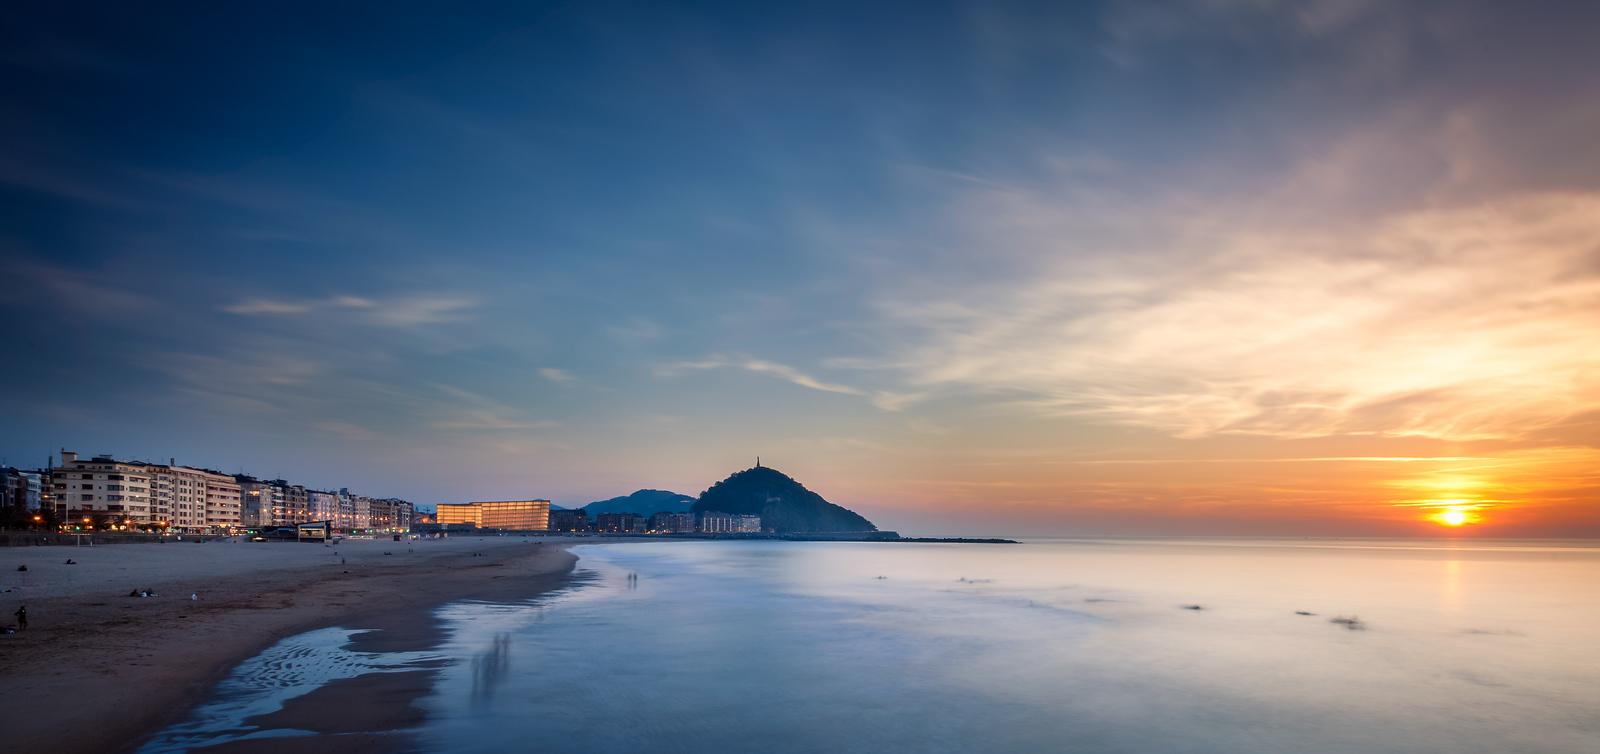 sunset over zuriola beach and mount urgull